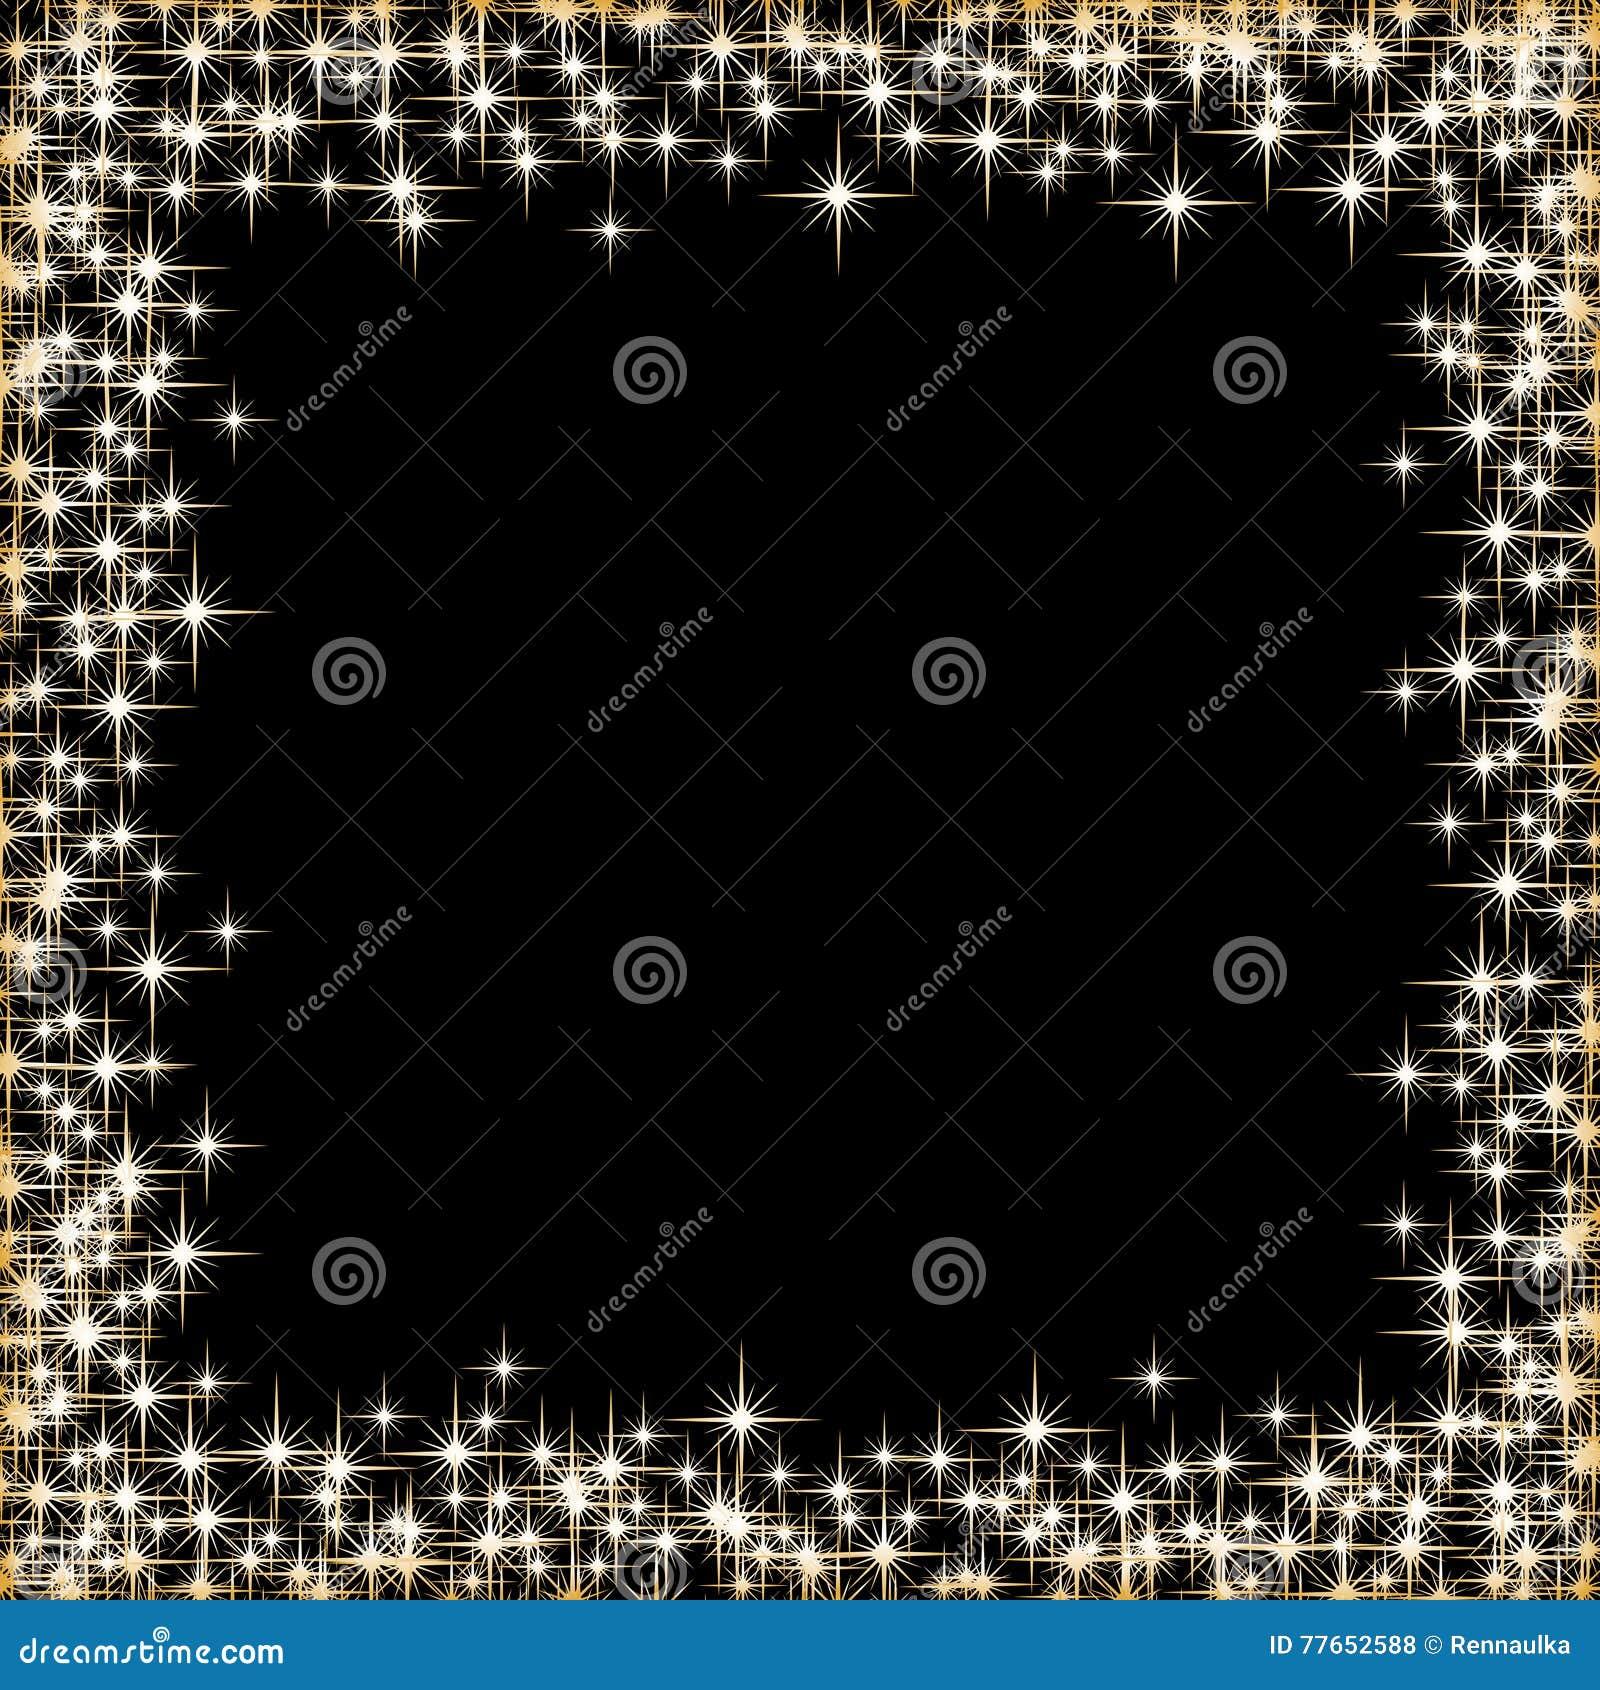 Frame With Golden Stars On The Black Background Sparkles Golden